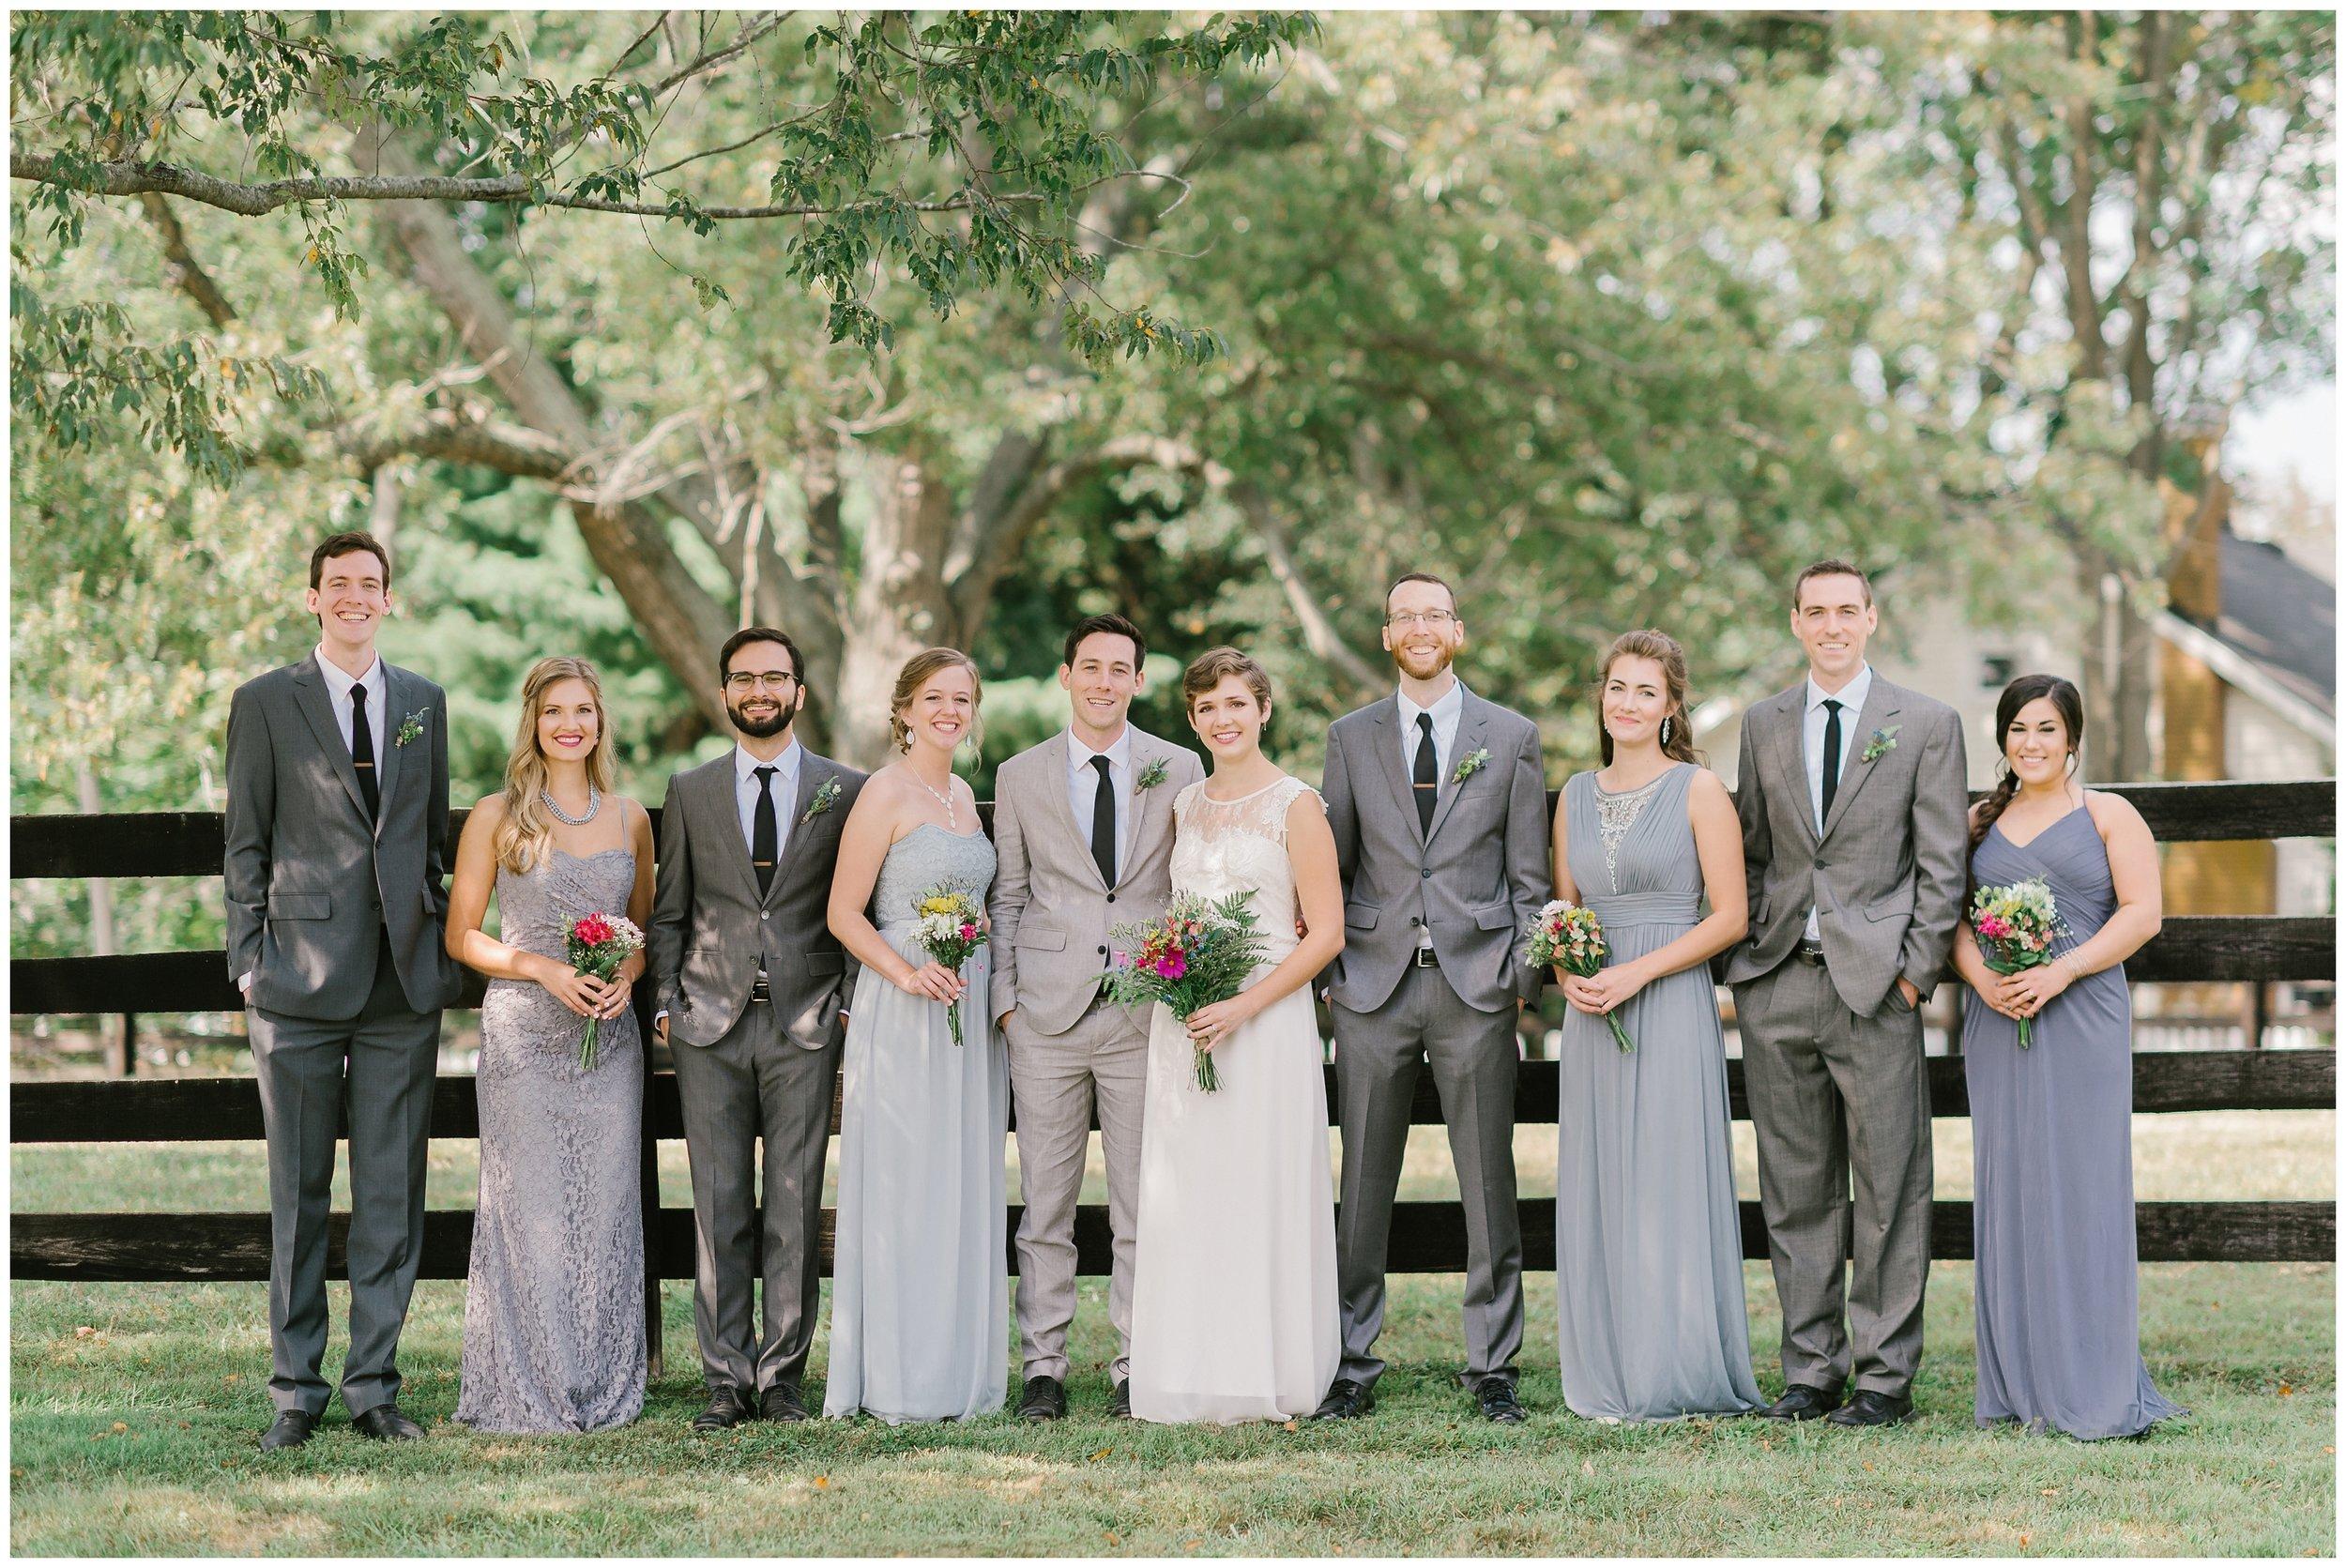 Rebecca_Shehorn_Photography_Indianapolis_Wedding_Photographer_7244.jpg